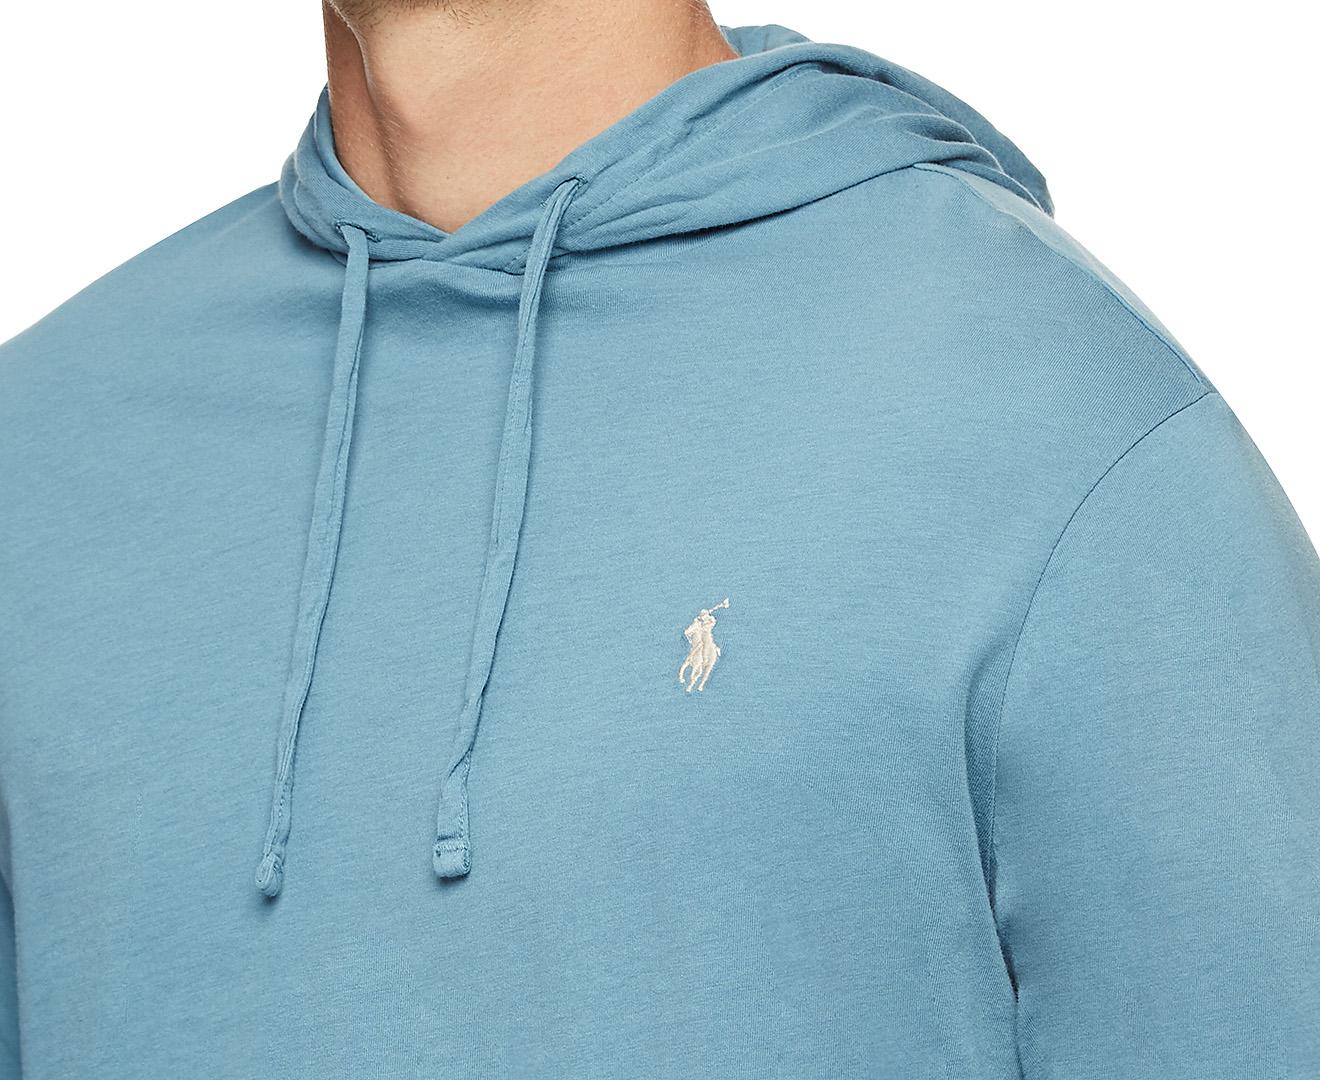 24b1fadd8e0a ... australia polo ralph lauren mens pullover hoodie light blue catch.au  5dd24 d1fbd